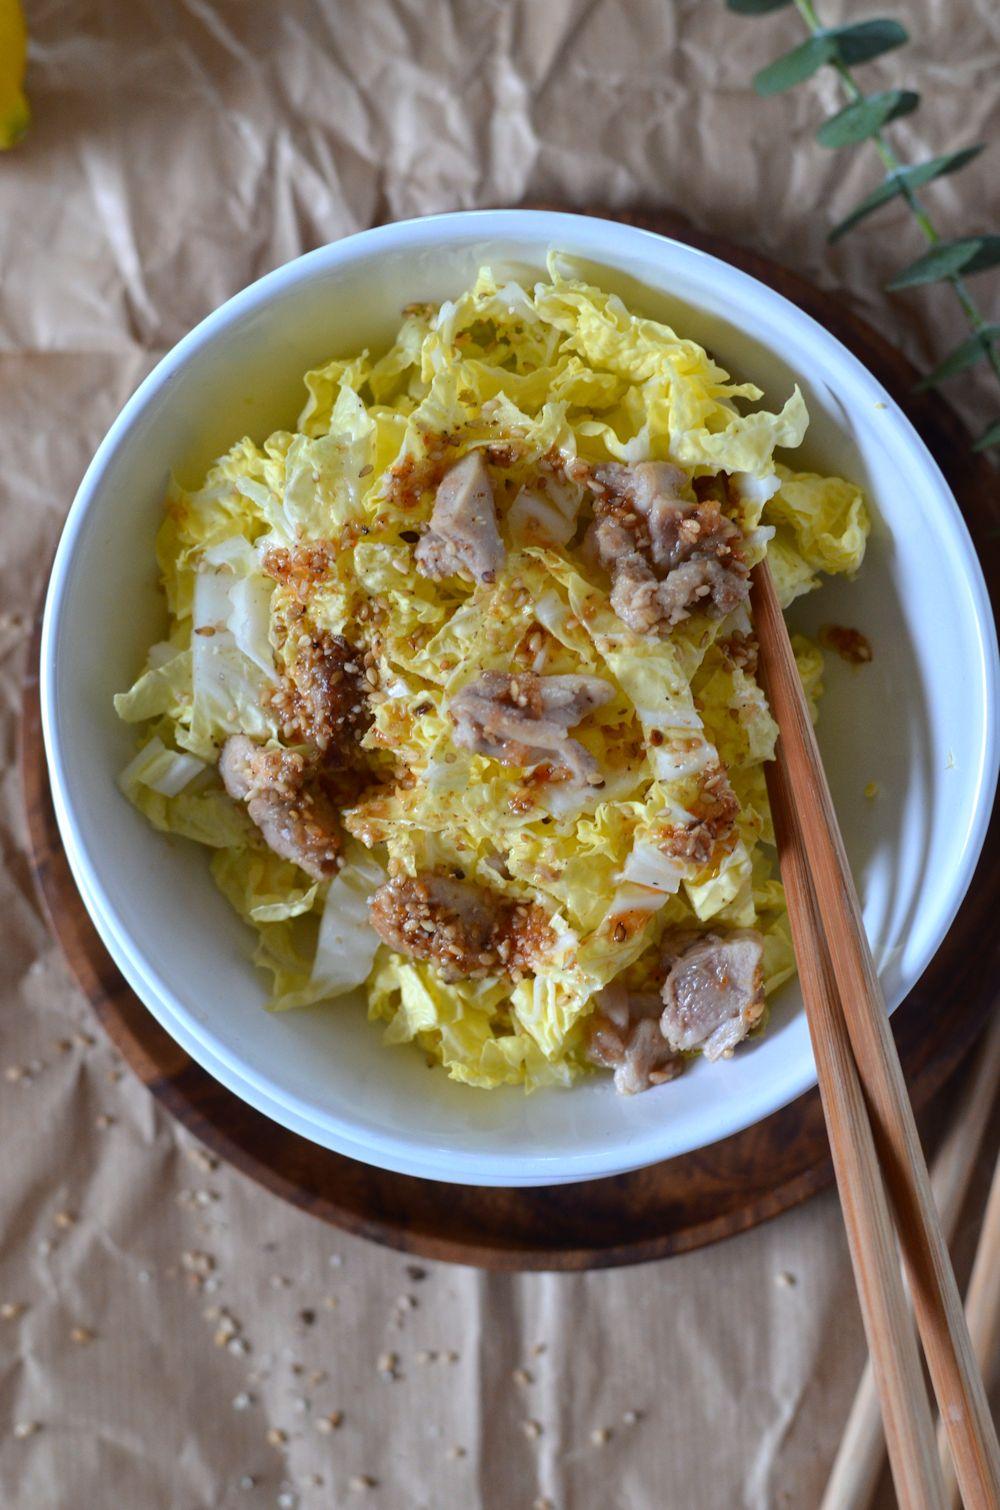 Salade de chou chinois au poulet et sésame